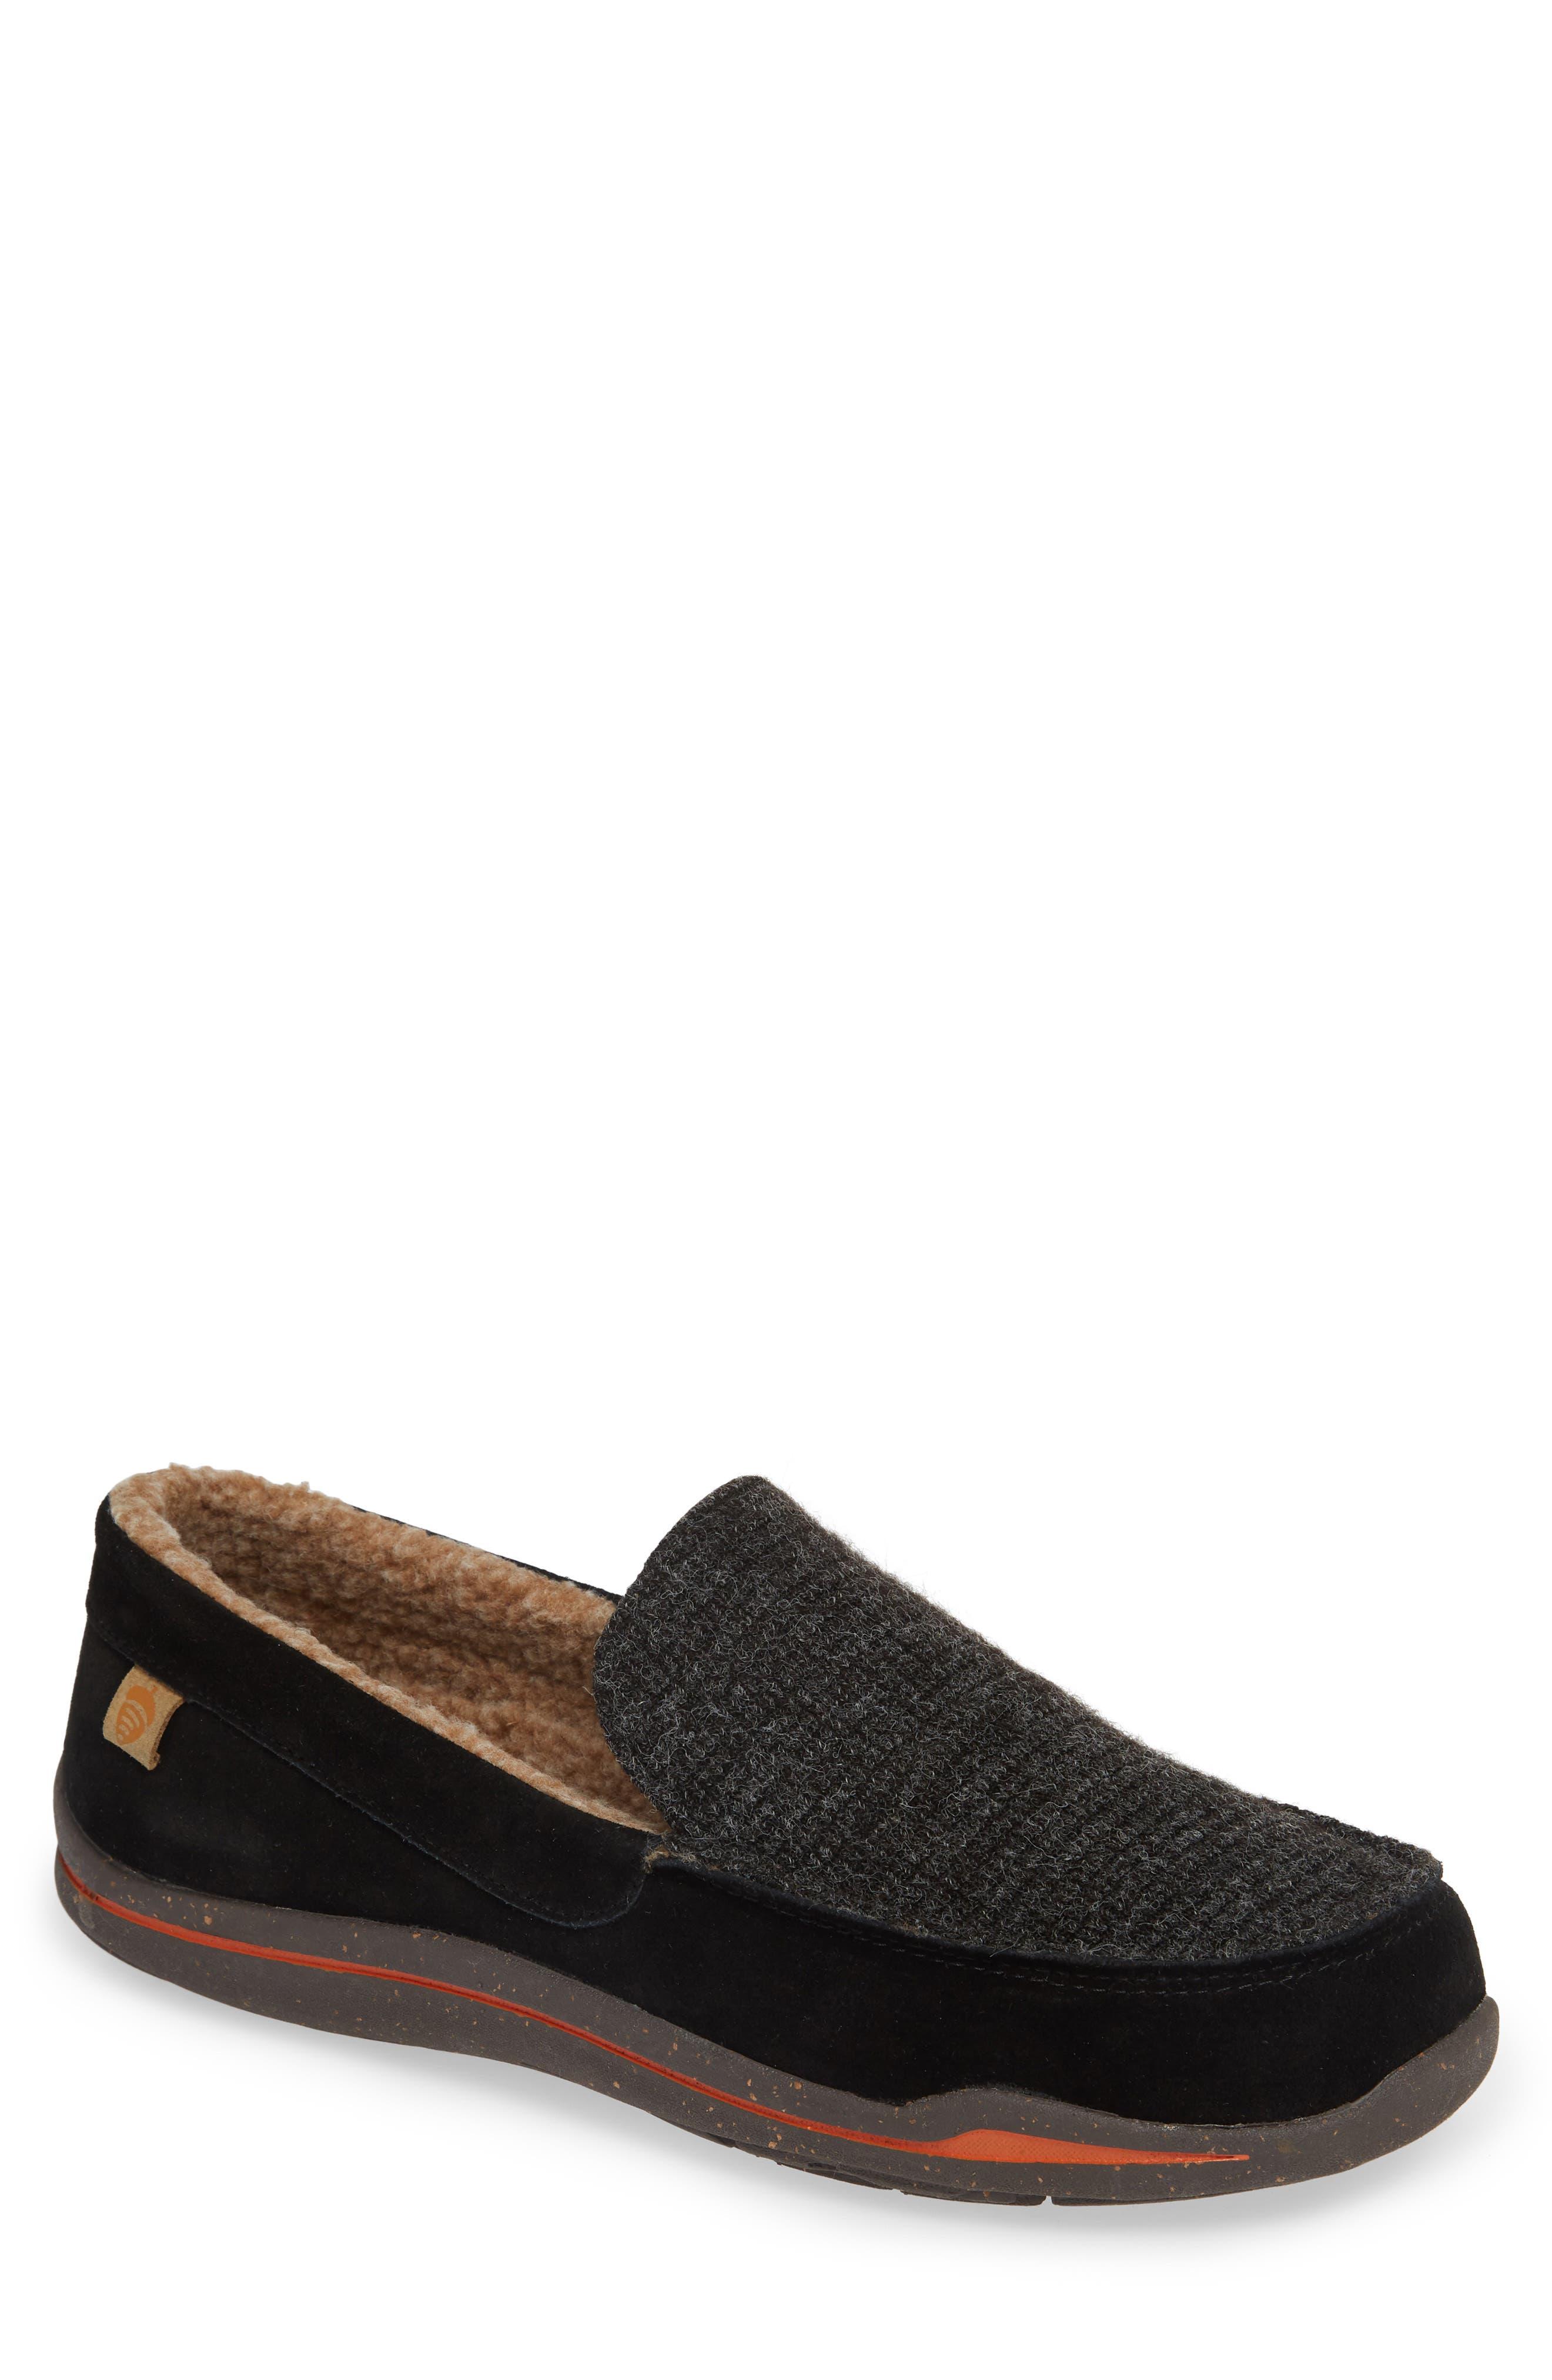 ACORN Ellsworth Moc Toe Slipper, Main, color, BLACK